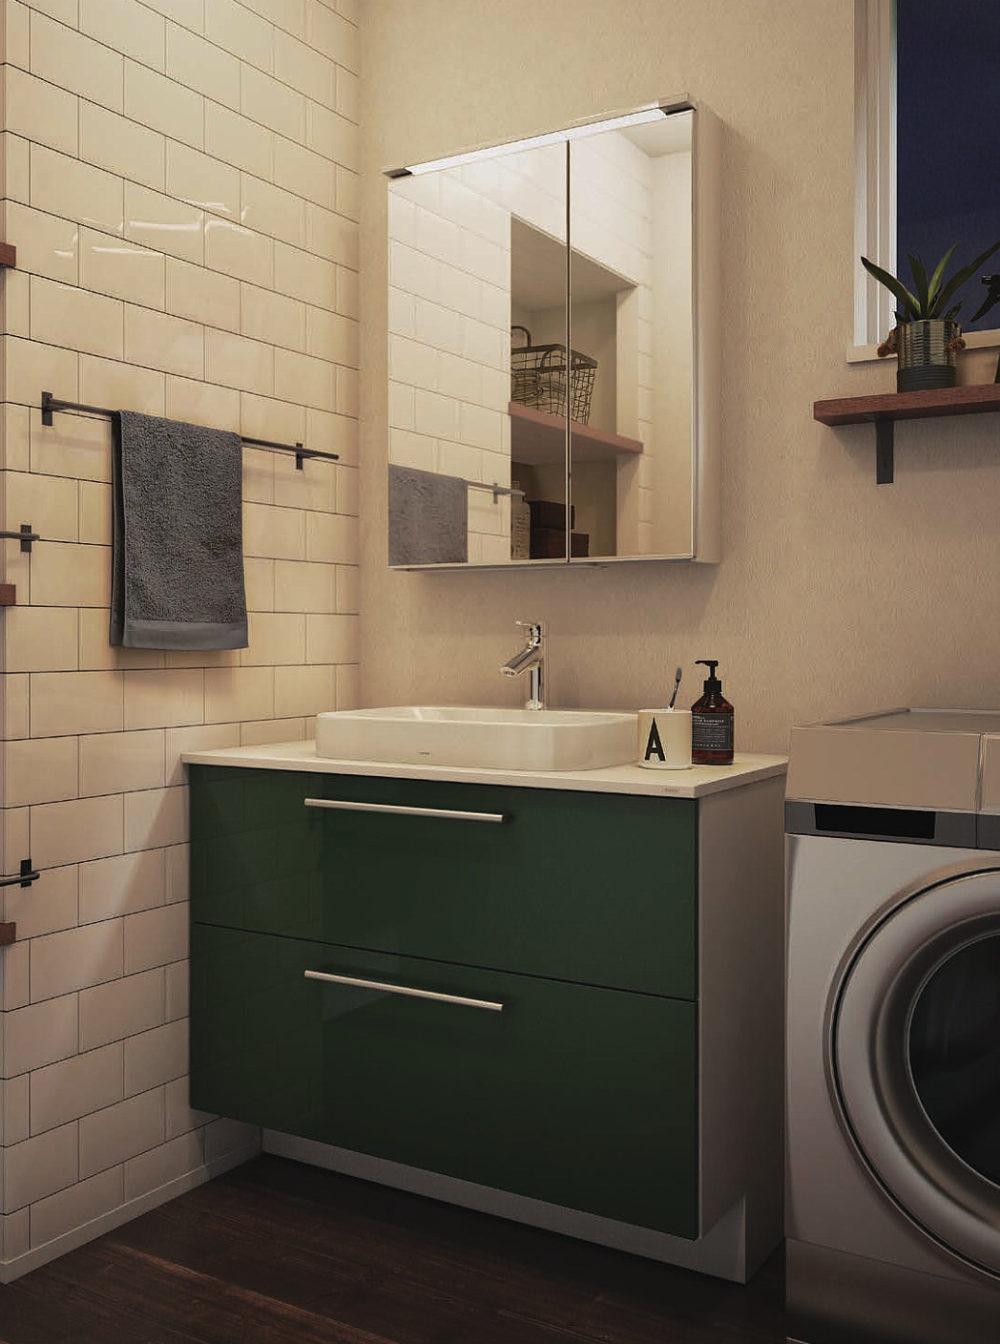 TOTO 新商品 洗面台ドレーナが8月に発売します。